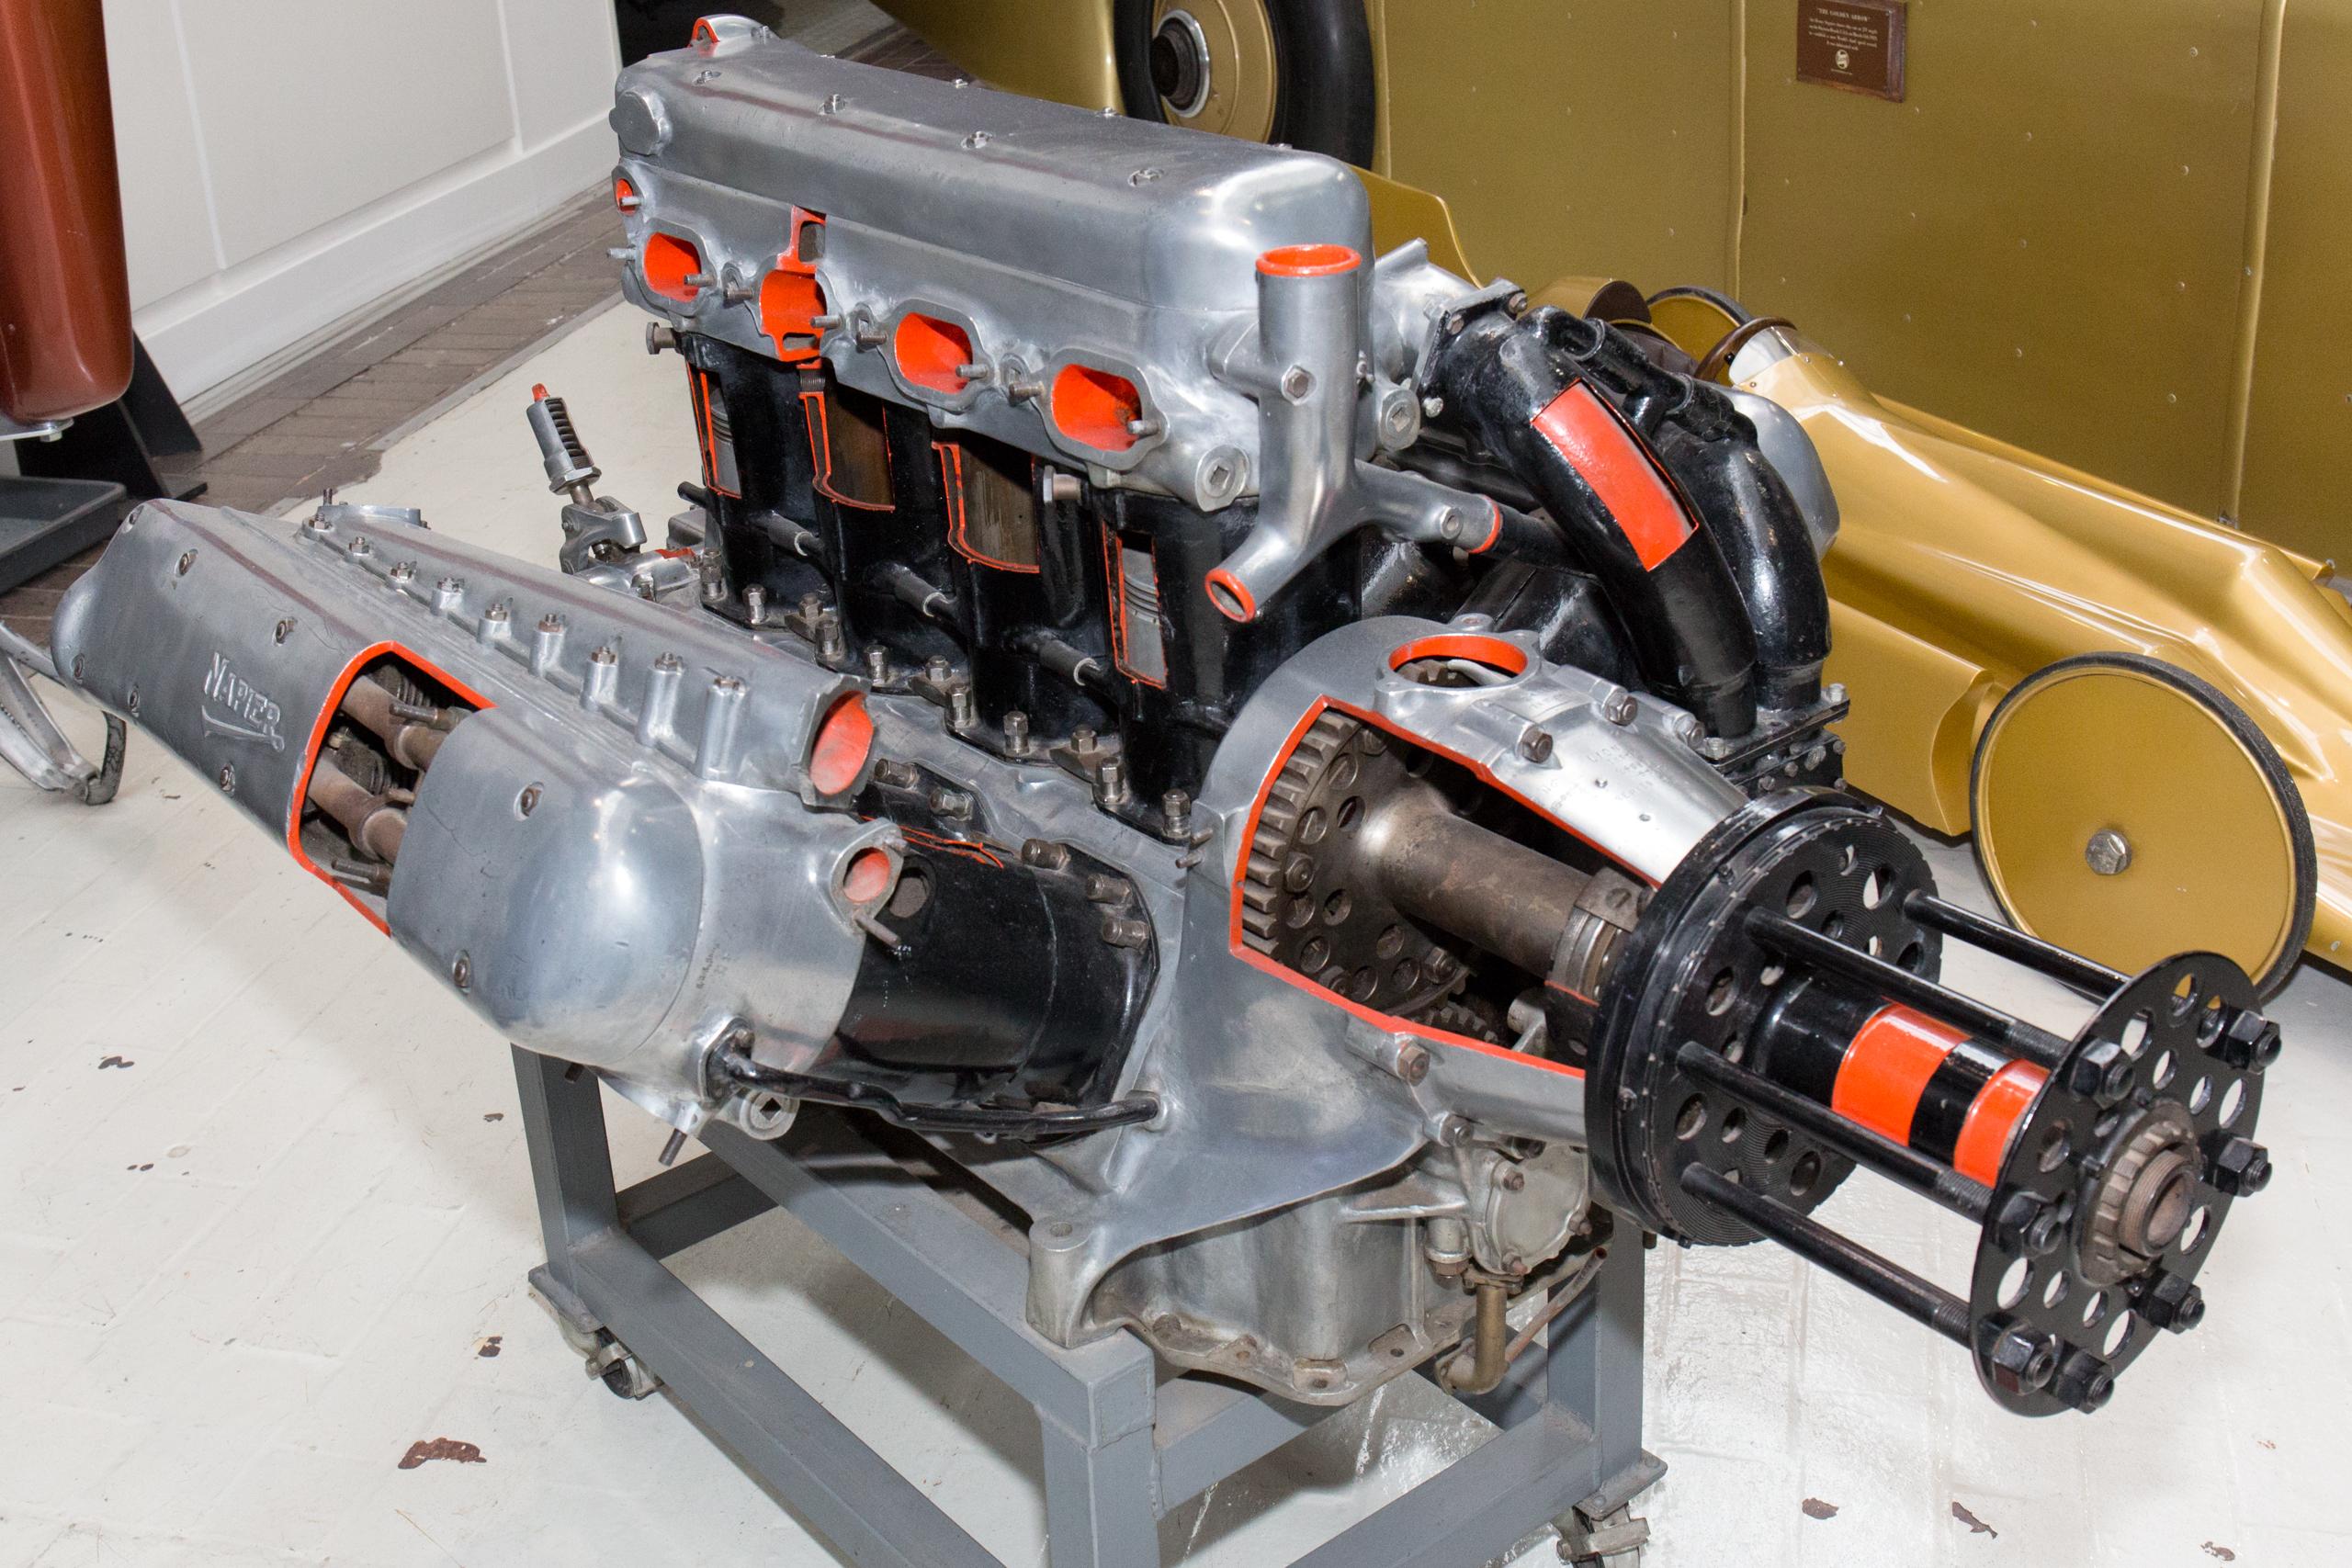 File:Napier Lion engine (cutaway) National Motor Museum, Beaulieu ...